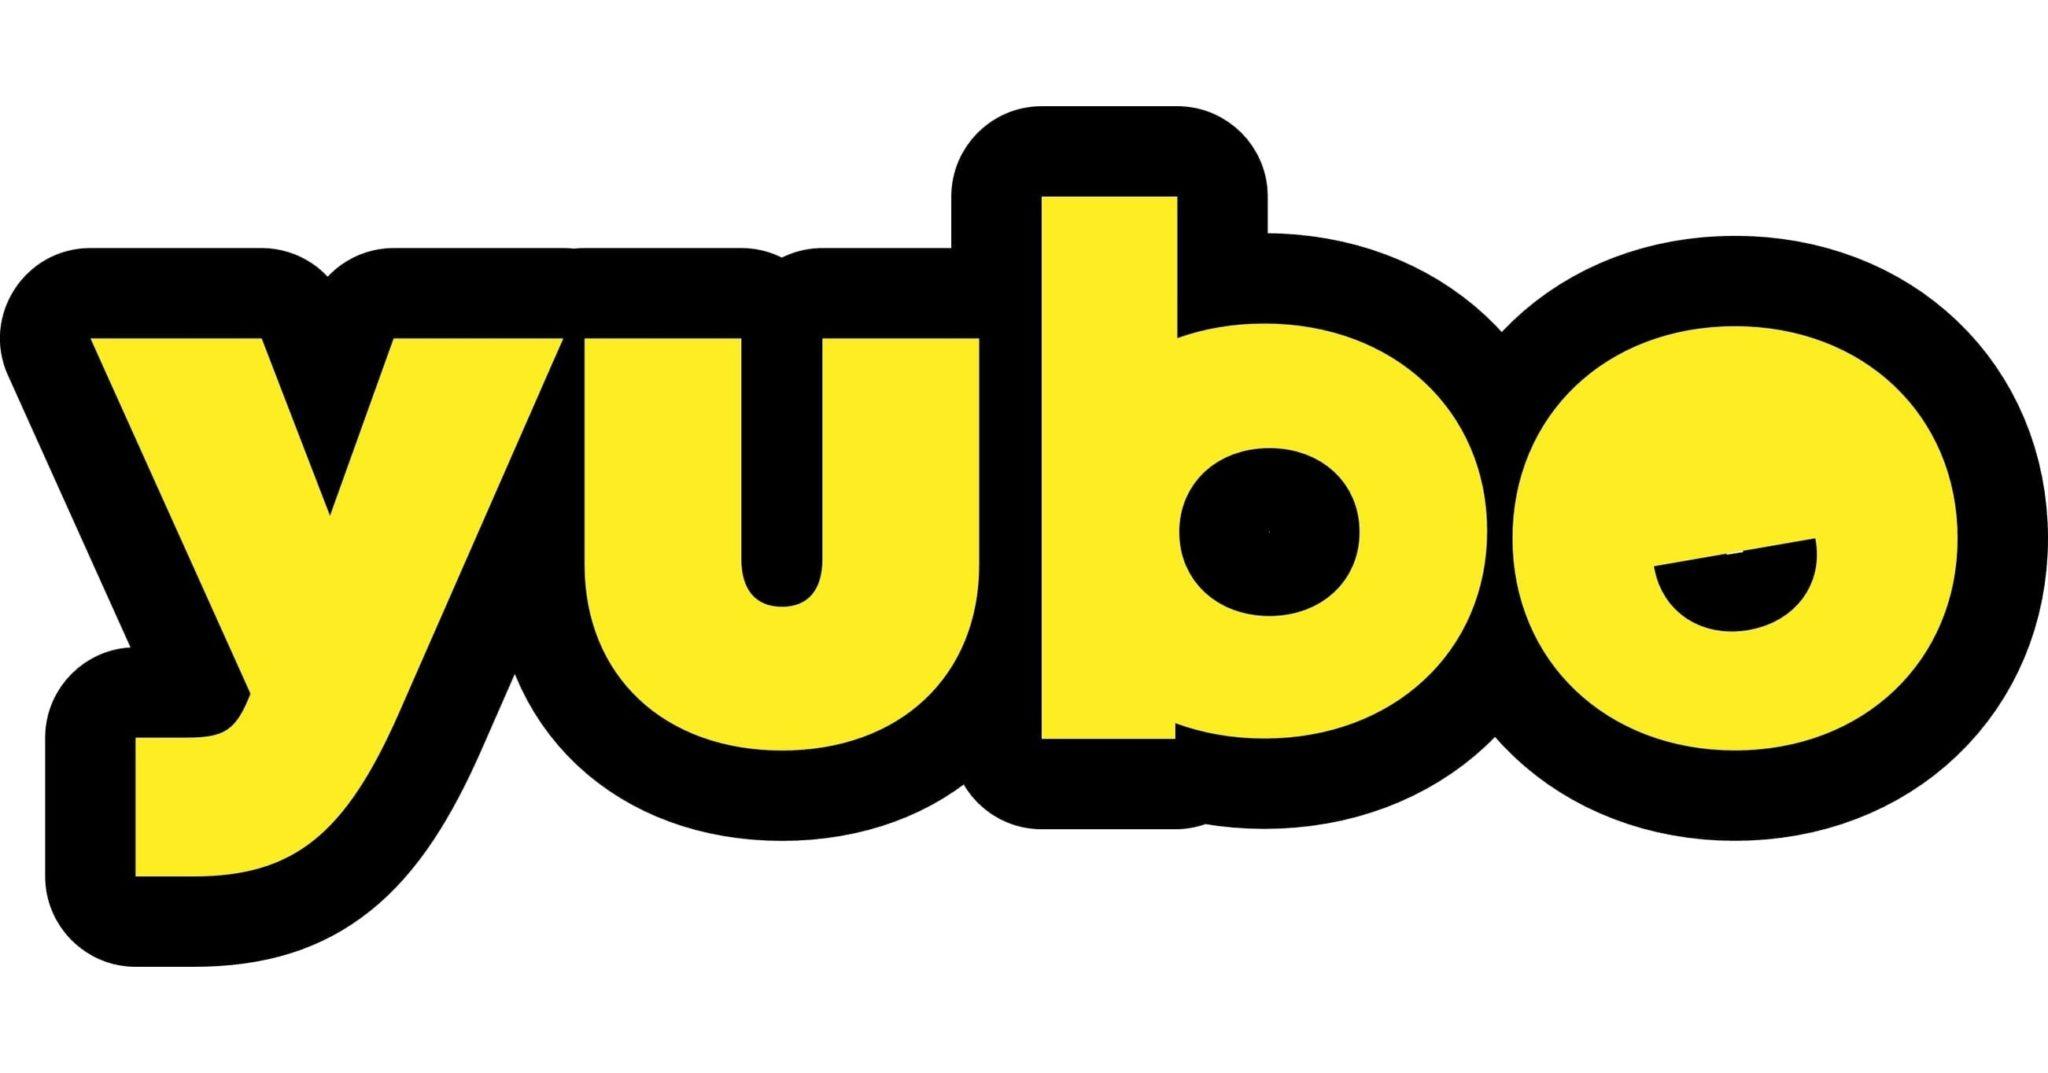 Yubo | Best Facebook Alternatives in 2021